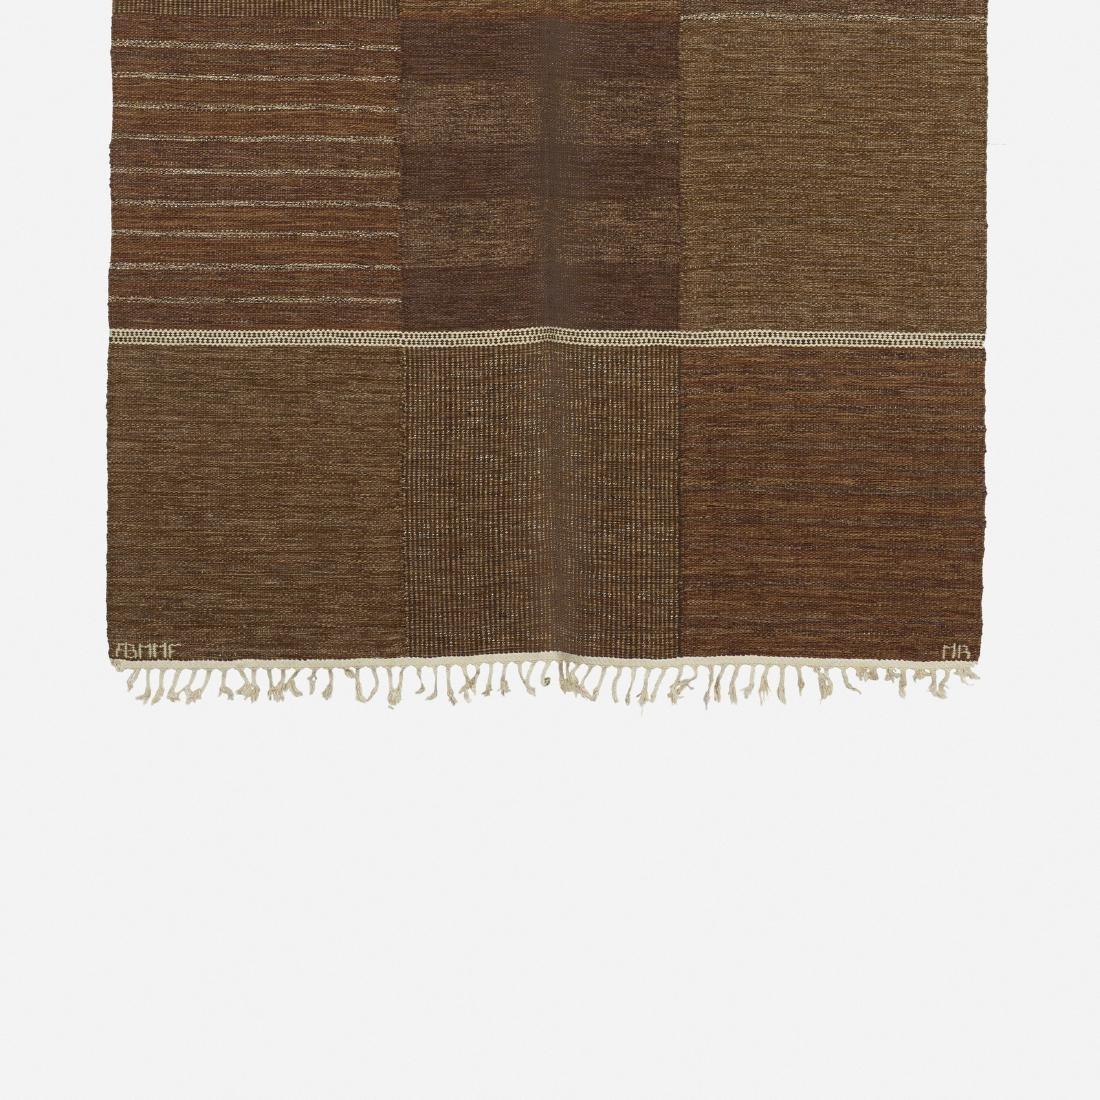 Marianne Richter, Tolv Rutor flatweave carpet - 2